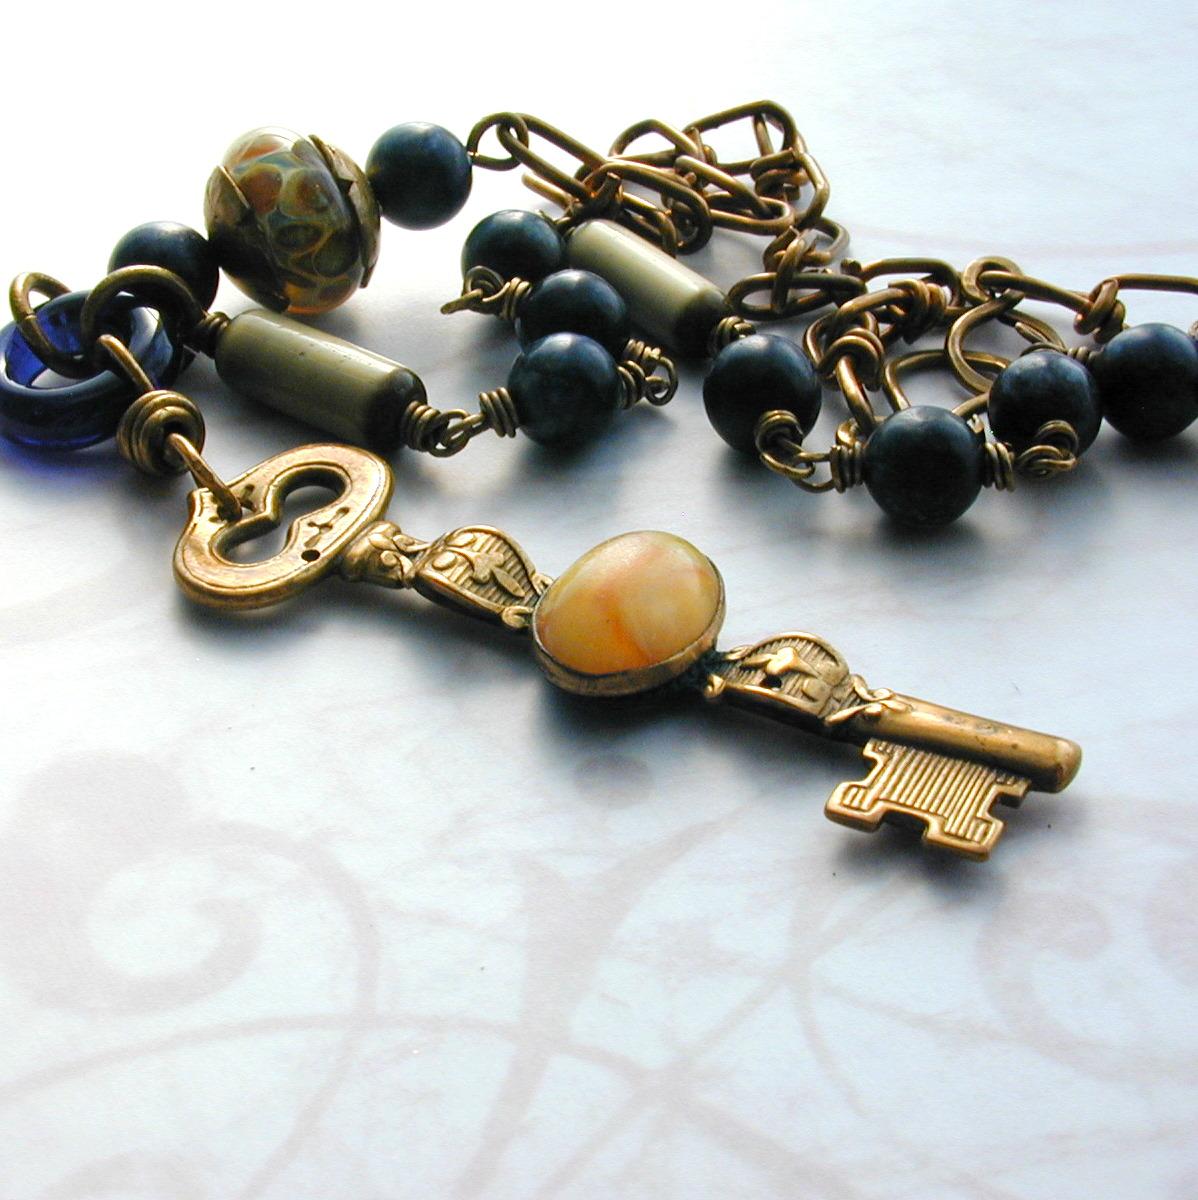 judith b designs creative jewelry